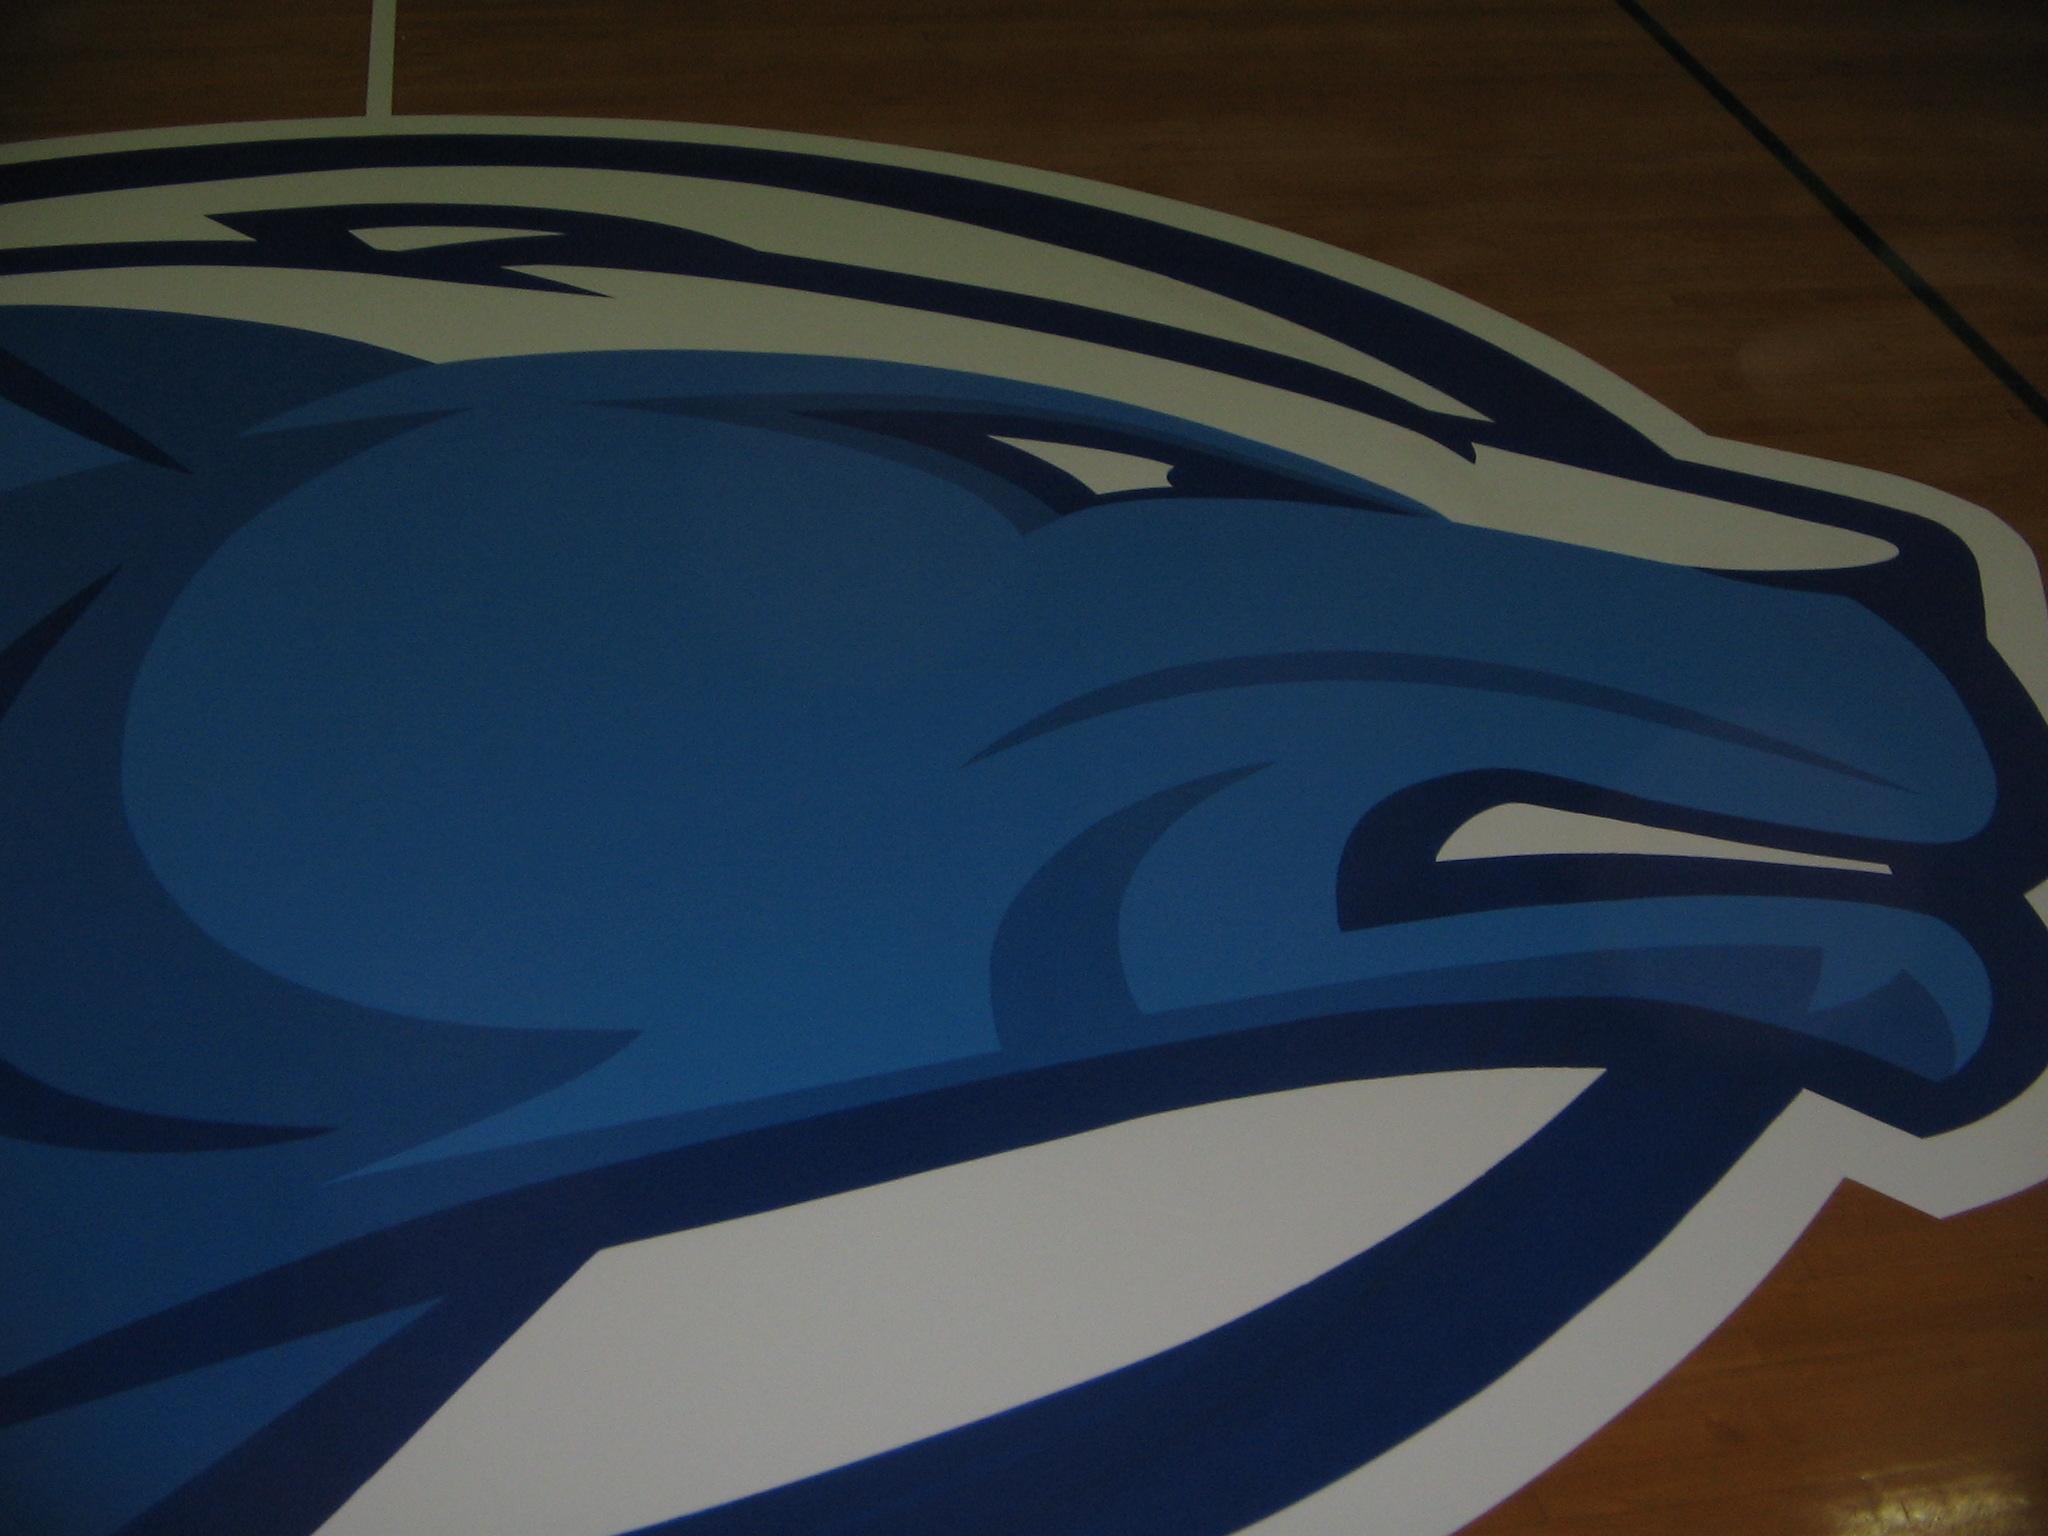 Logo - Lyon - Wheaton College - Norton MA.JPG